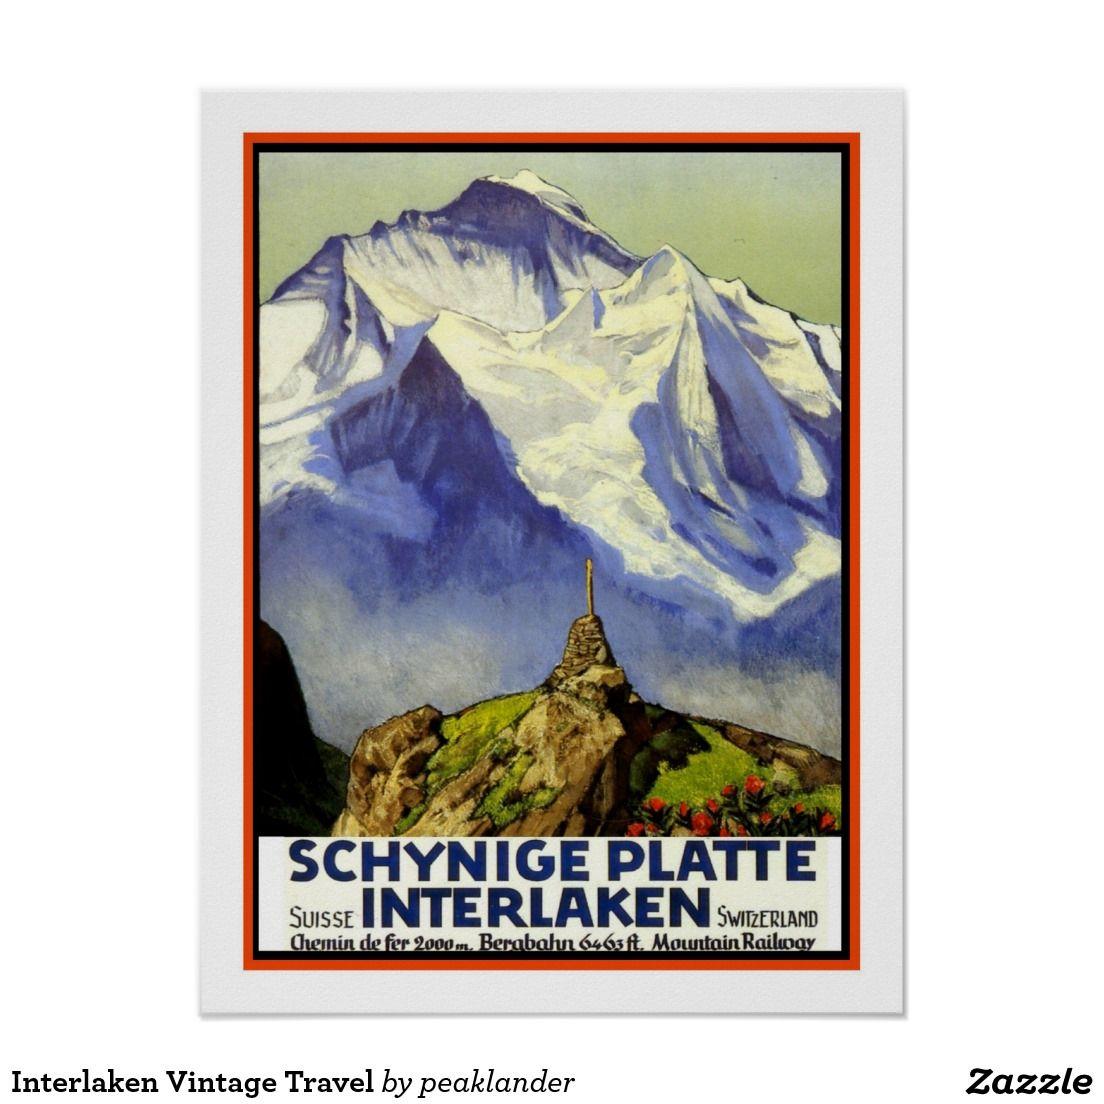 Interlaken vintage travel poster with images